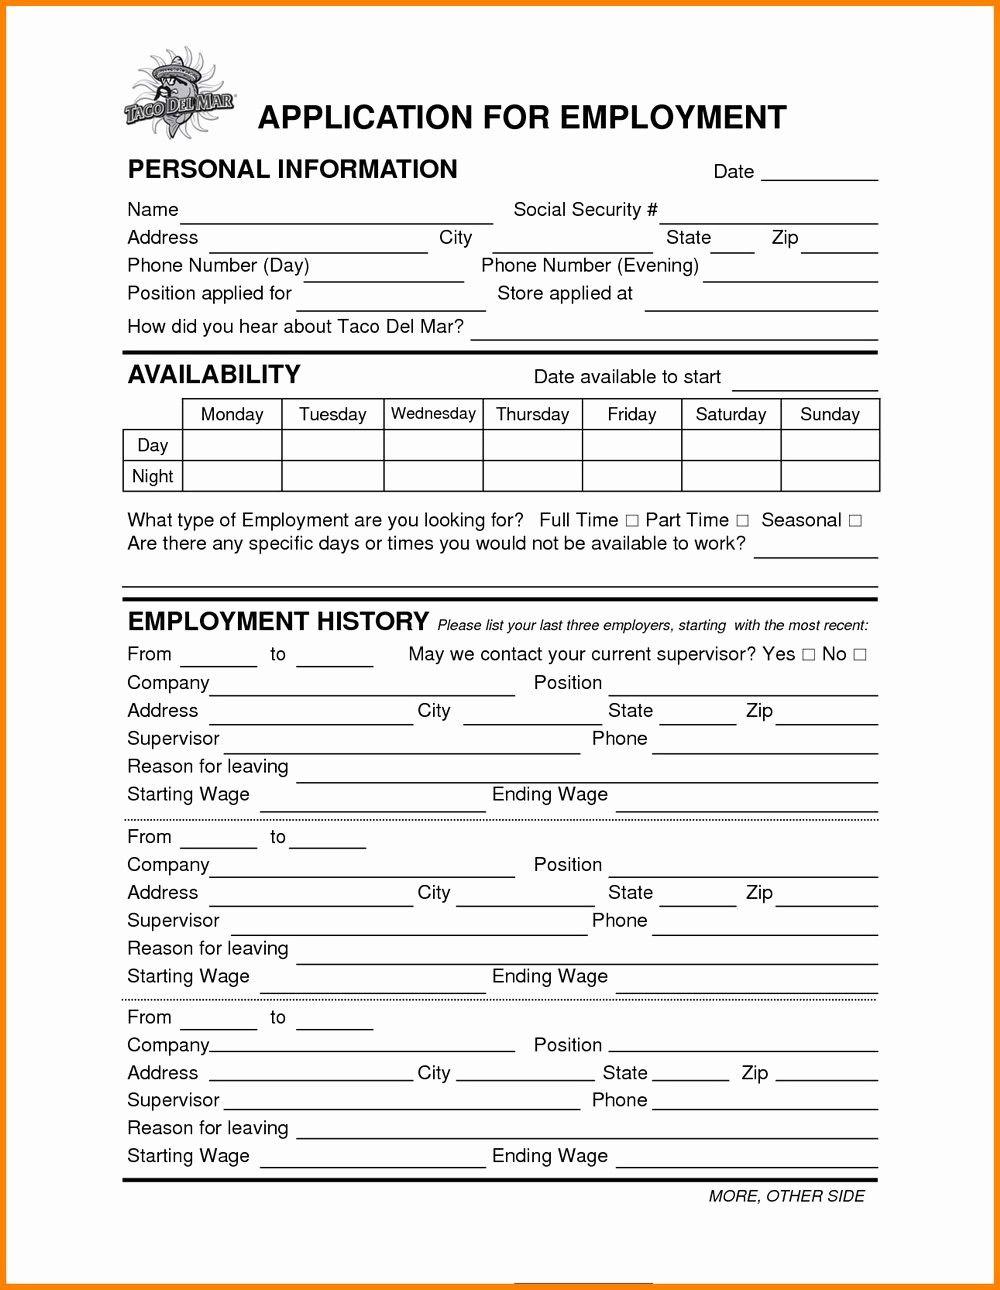 Wawa Job Application form Pdf Fresh Taco John S Line Job